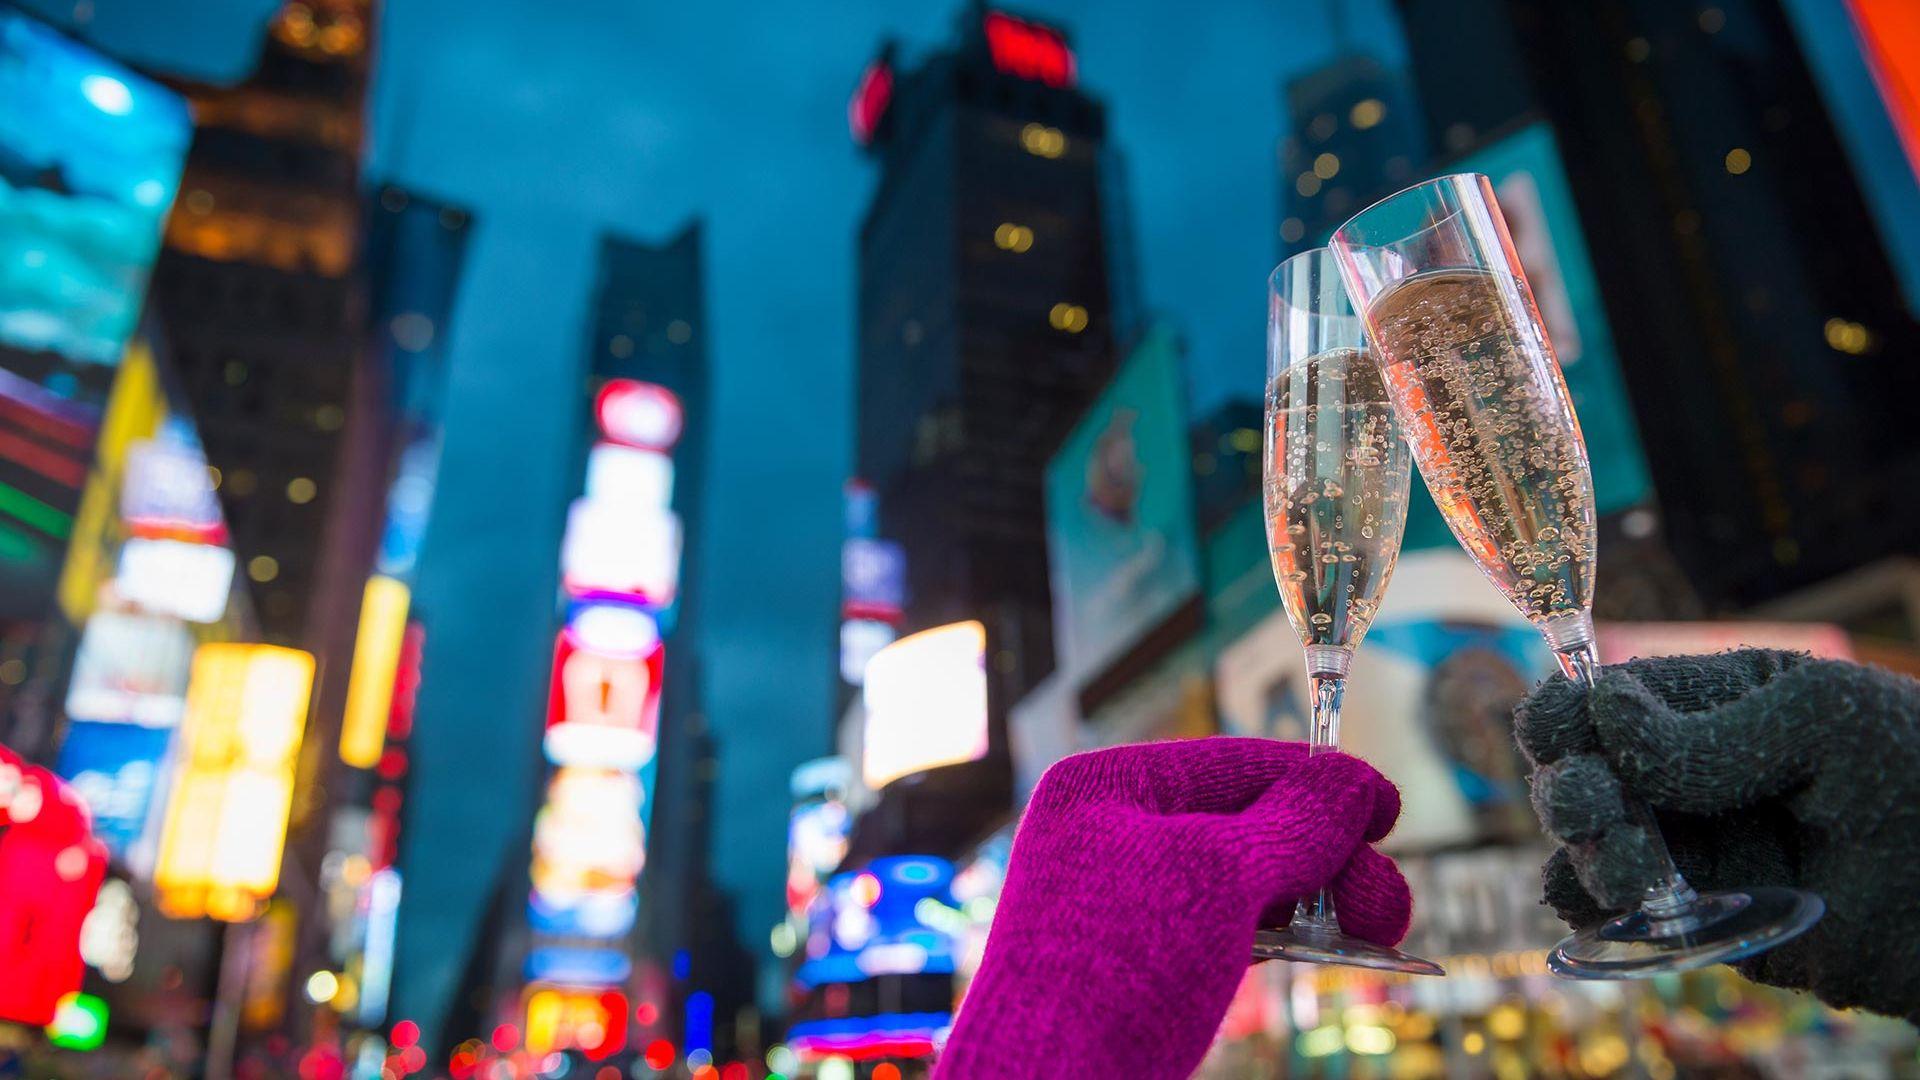 Revelion 2022 - Sejur New York, 8 zile - 30 decembrie